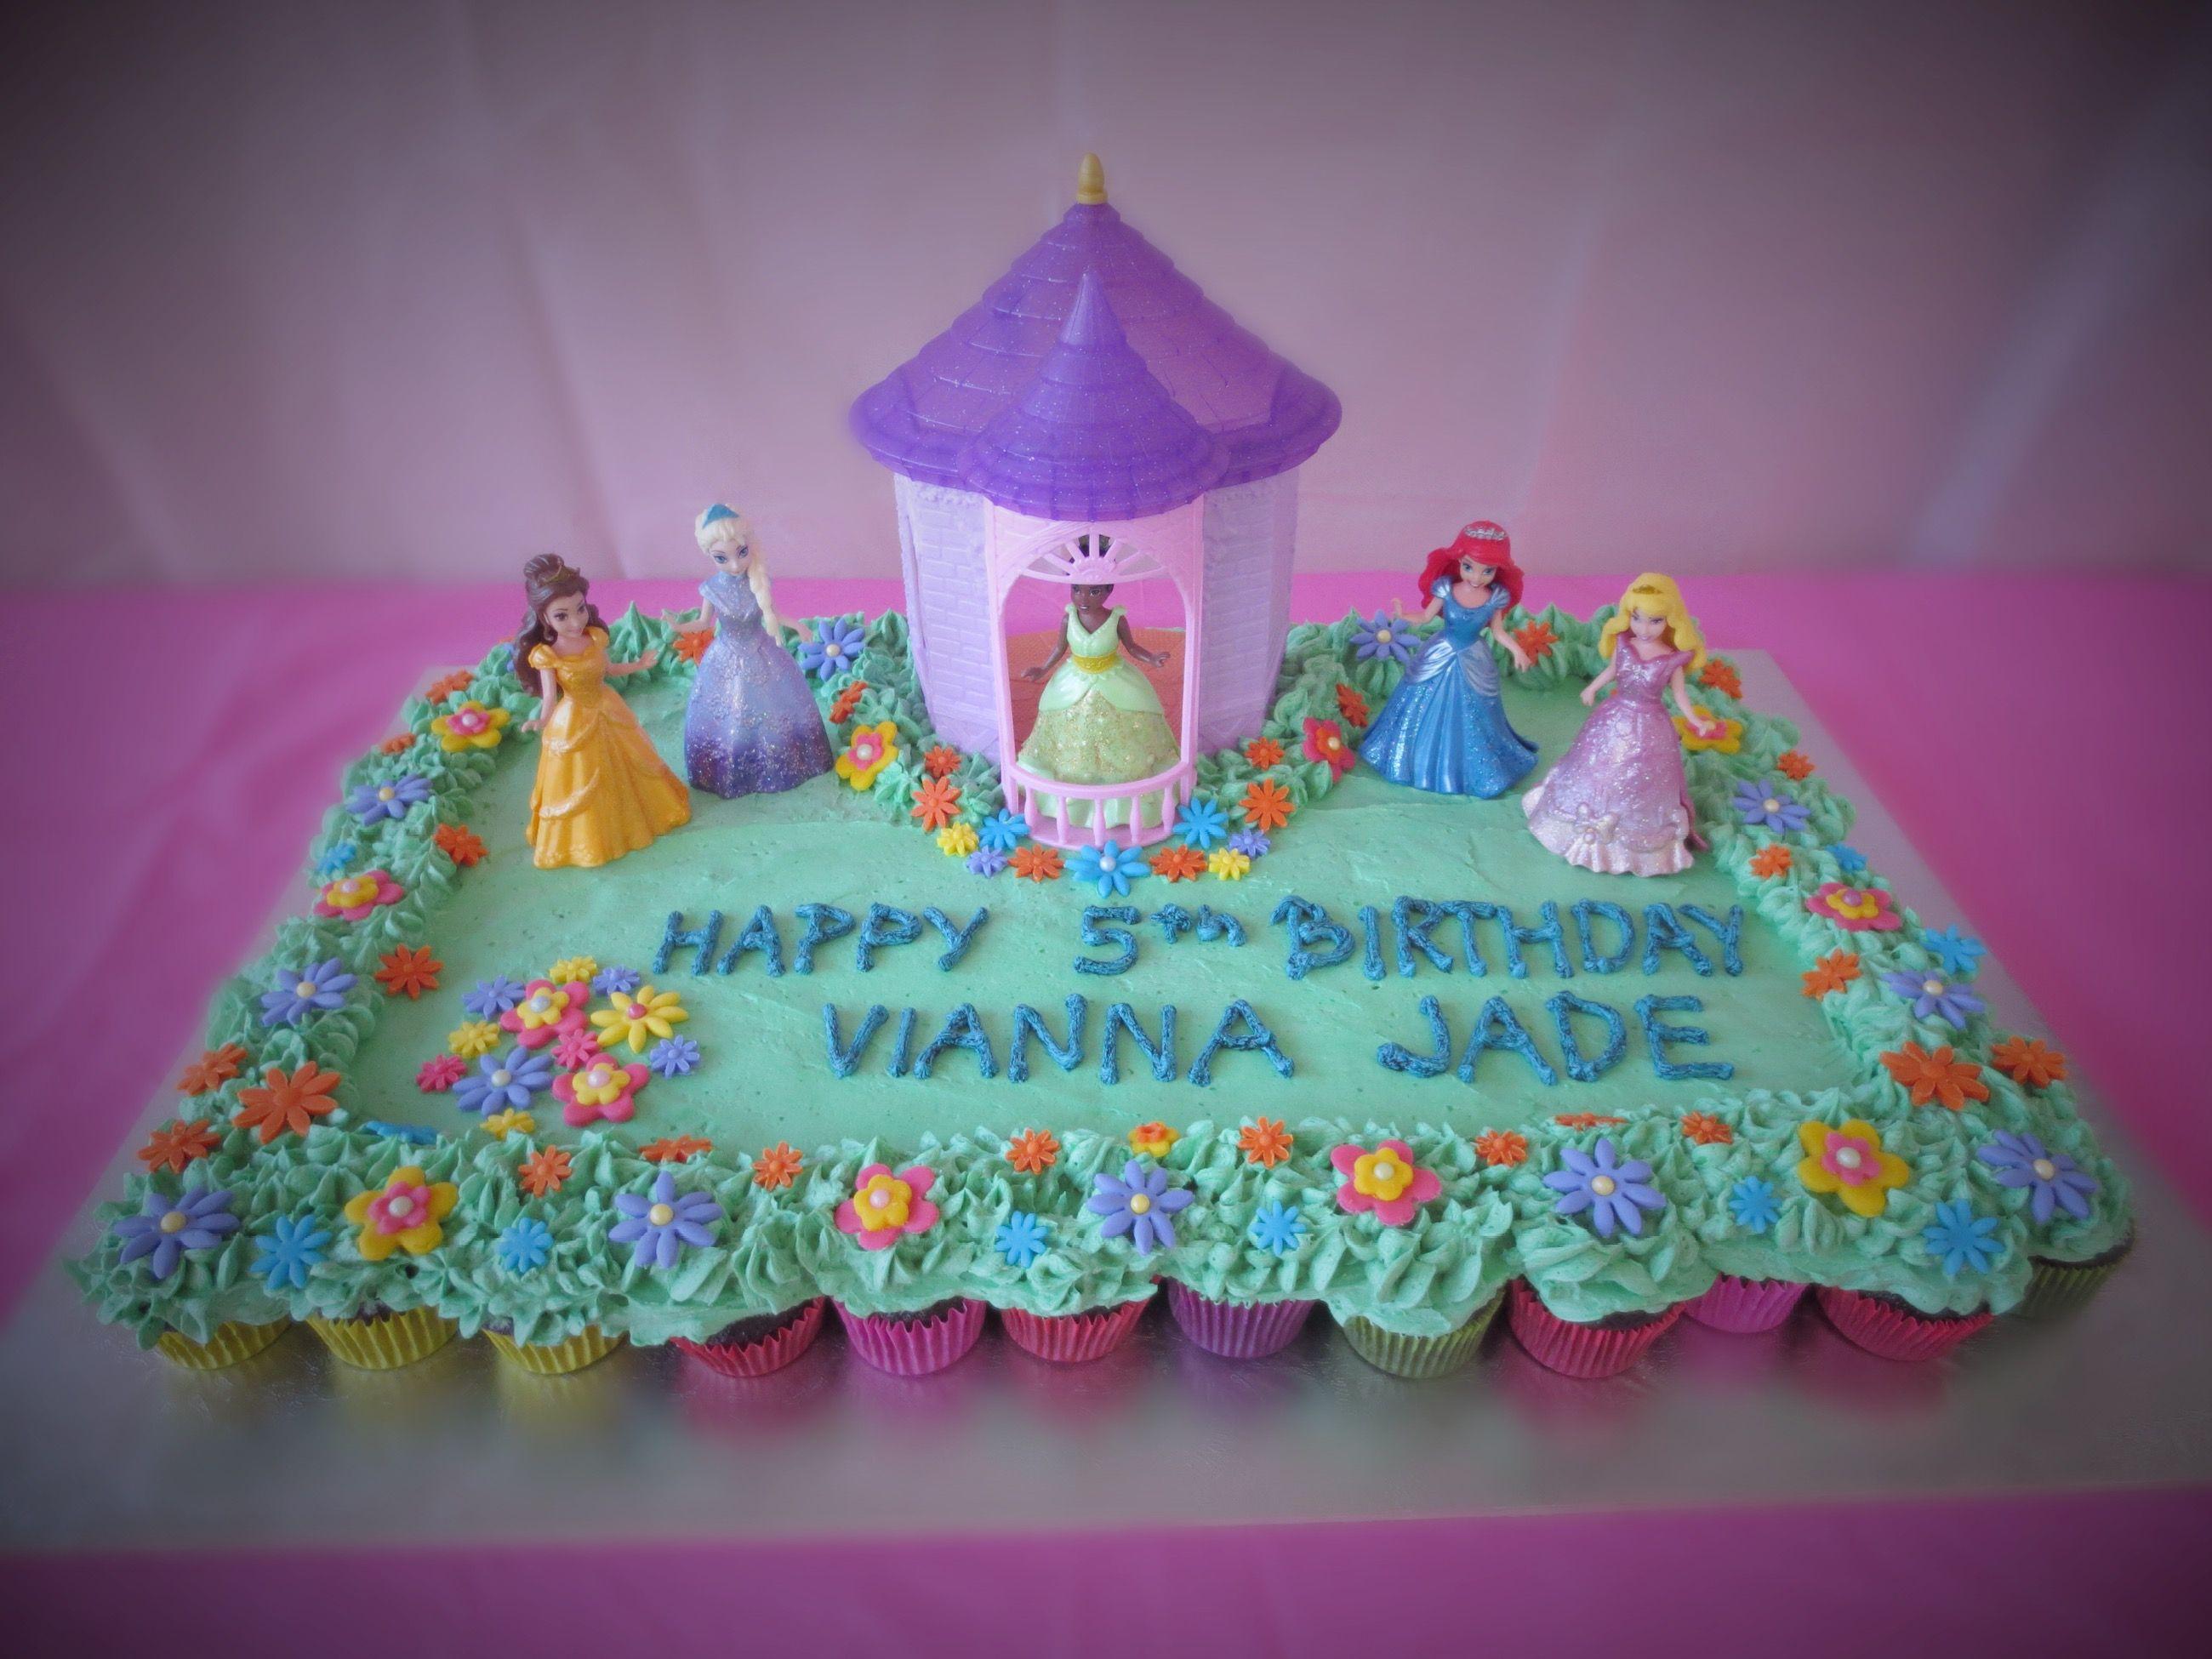 Fabulous Disney Princess Birthday Cake Pull Apart Cupcakes Cake Easy Funny Birthday Cards Online Inifodamsfinfo